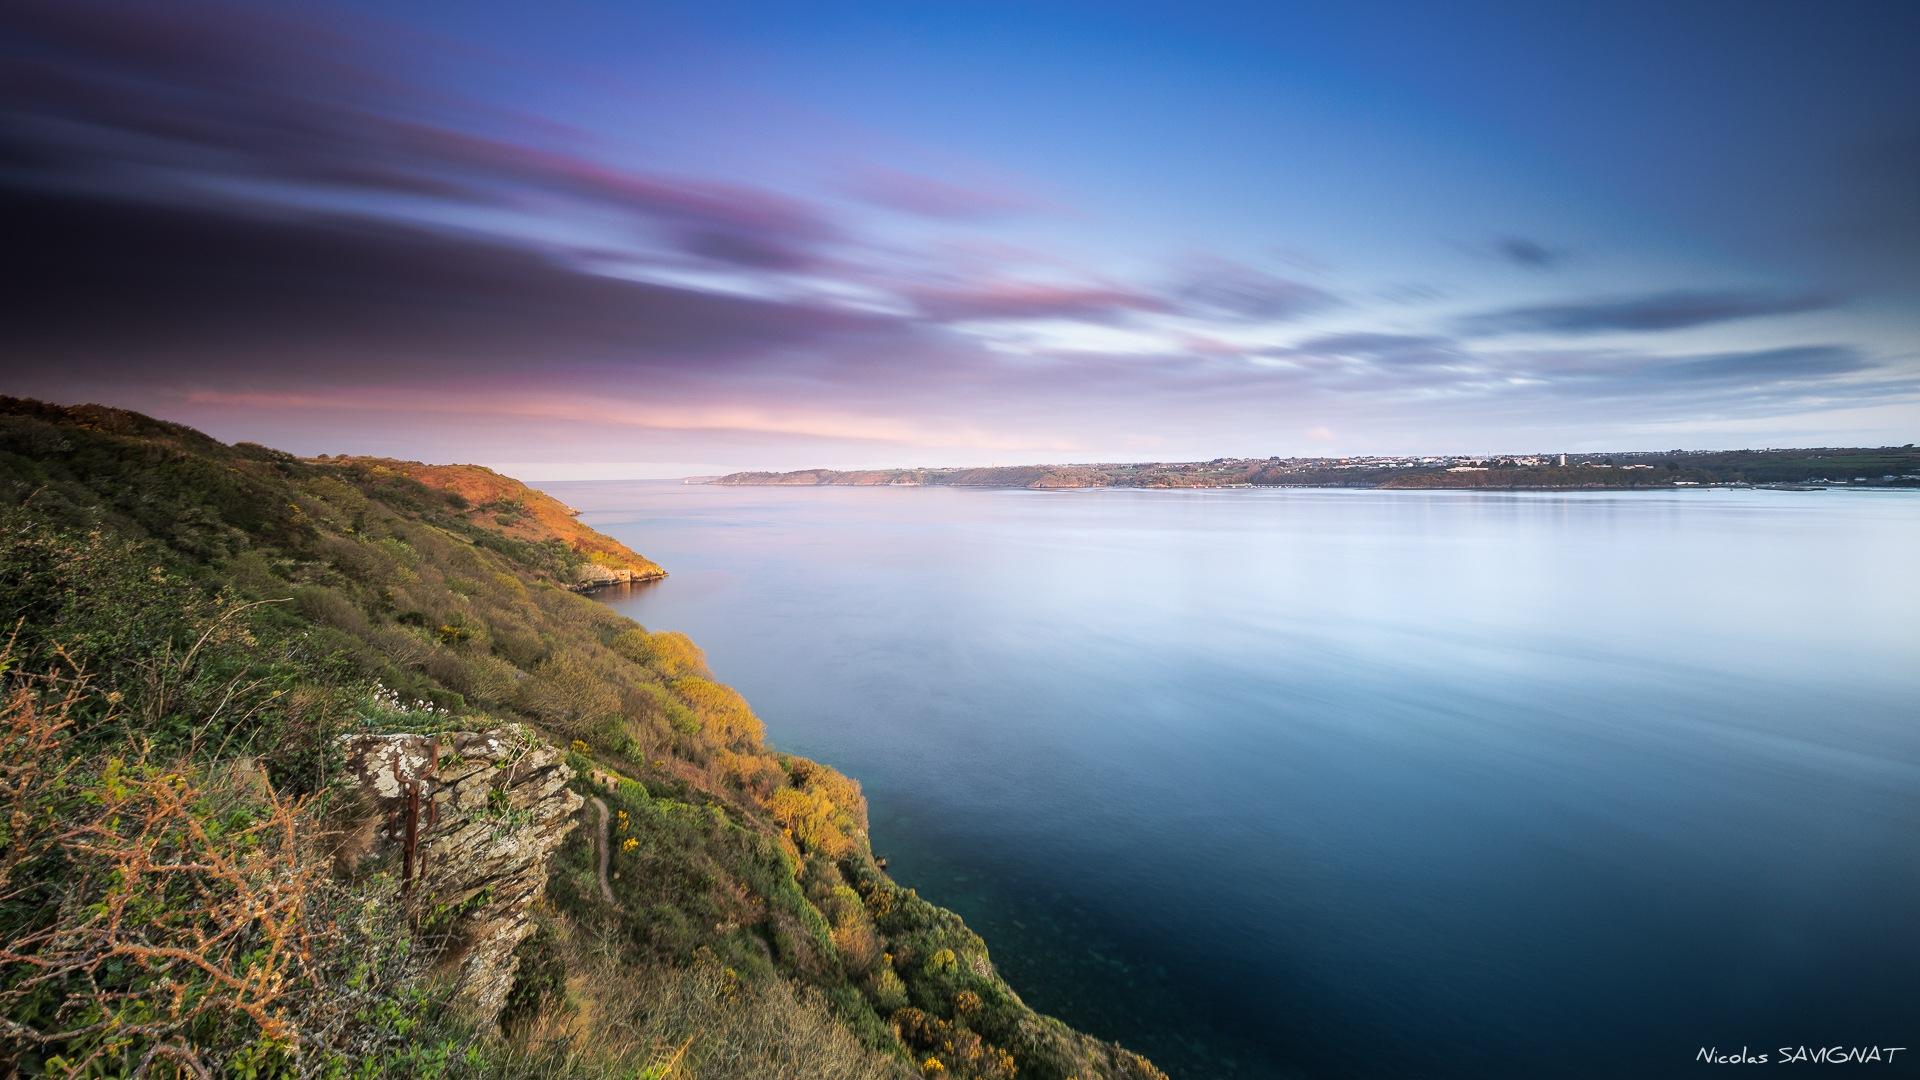 Pointe des Espagnols - Sunrise by Nicolas SAVIGNAT